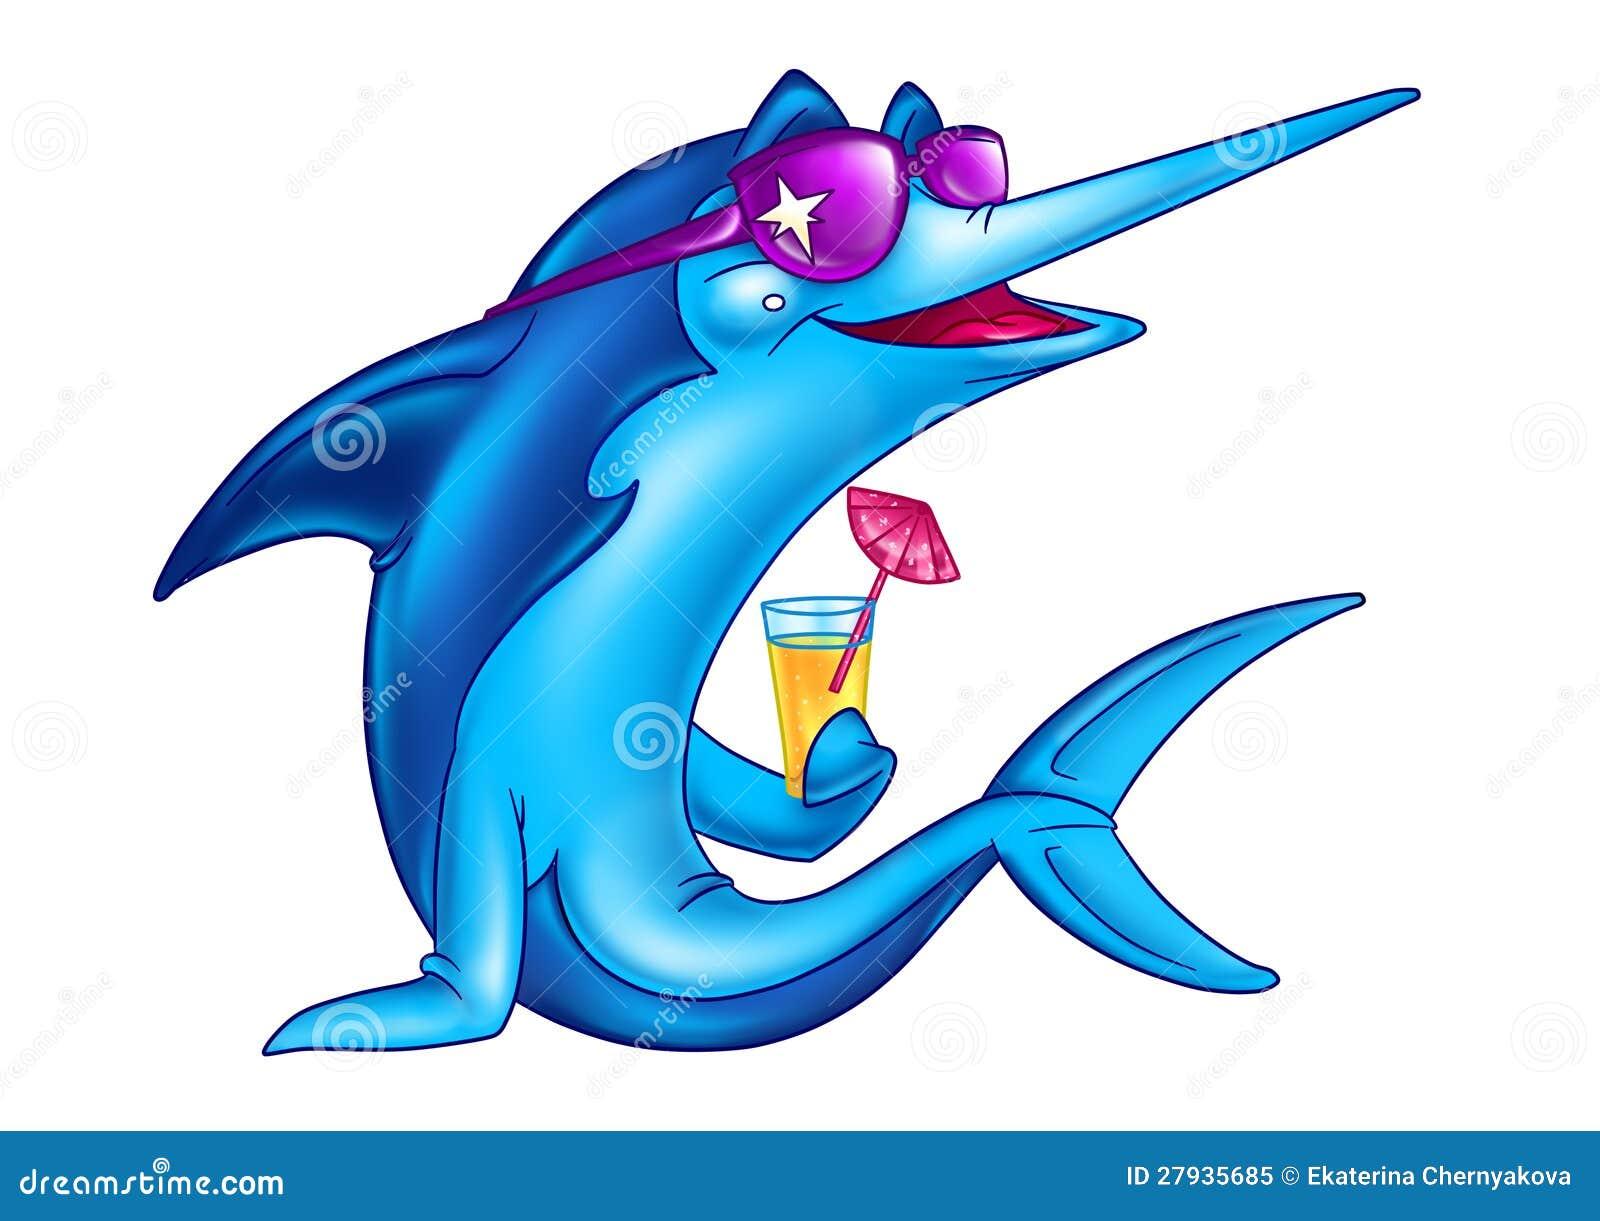 Fish On Vacation Cartoon Royalty Free Stock Photo - Image: 27935685